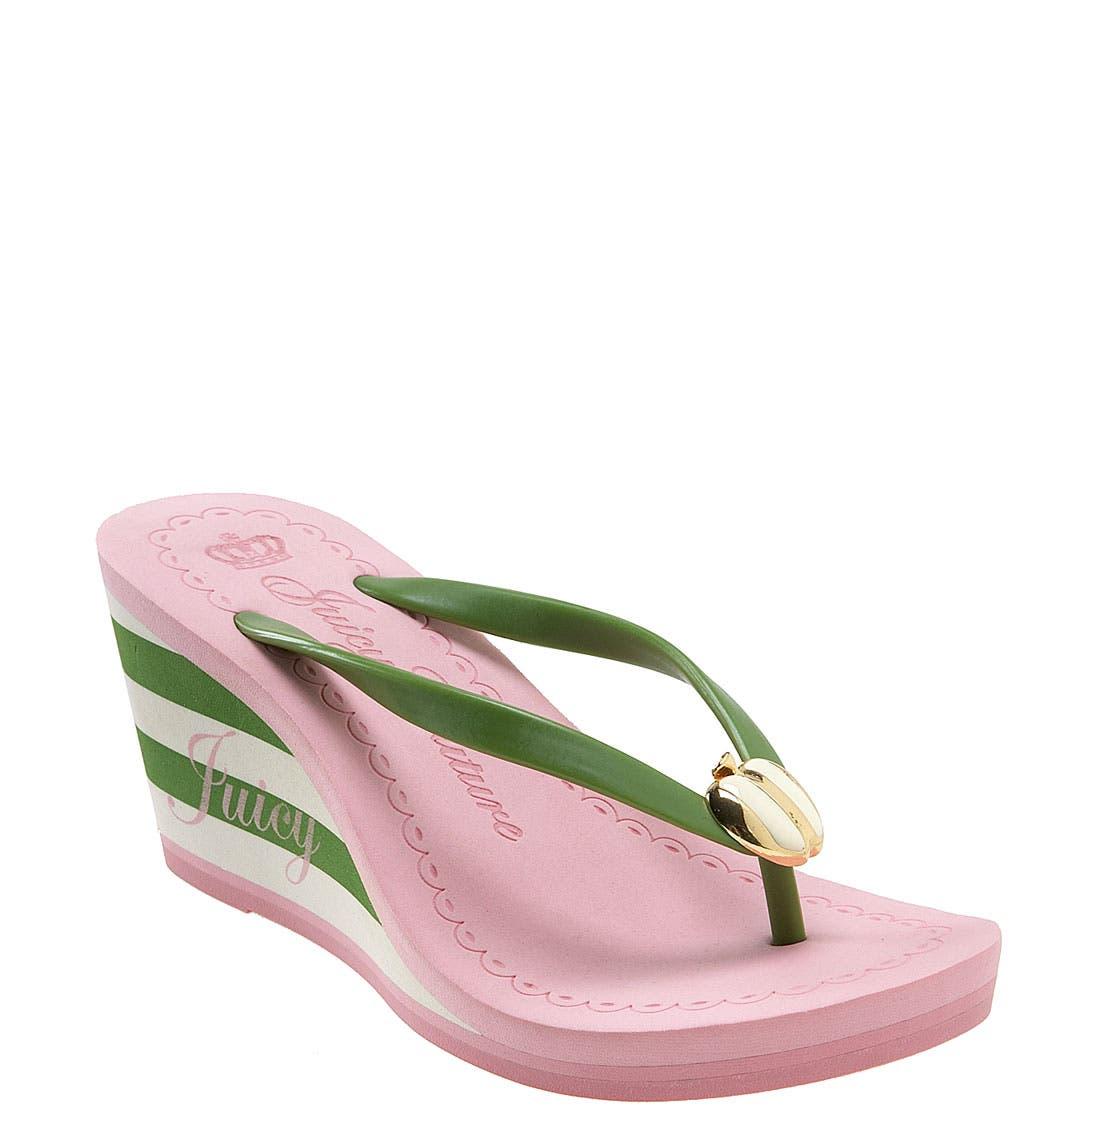 Juicy Couture 'Laney' Wedge Flip Flop